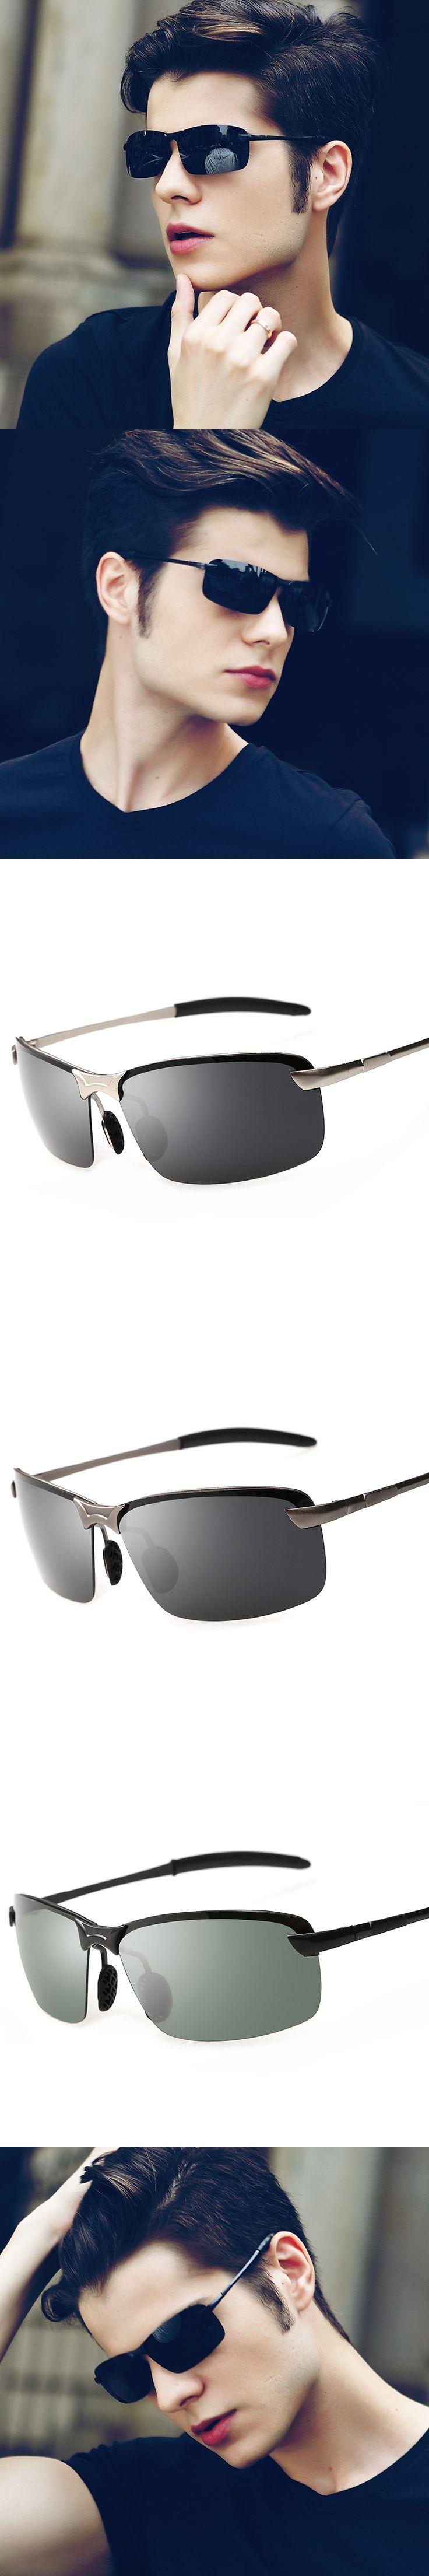 2016 Summer Style High Quality Polarized Sunglasses Brand Designer Sun Glasses with Logo Oculos De Sol UV400 Eyewear jd003 z55